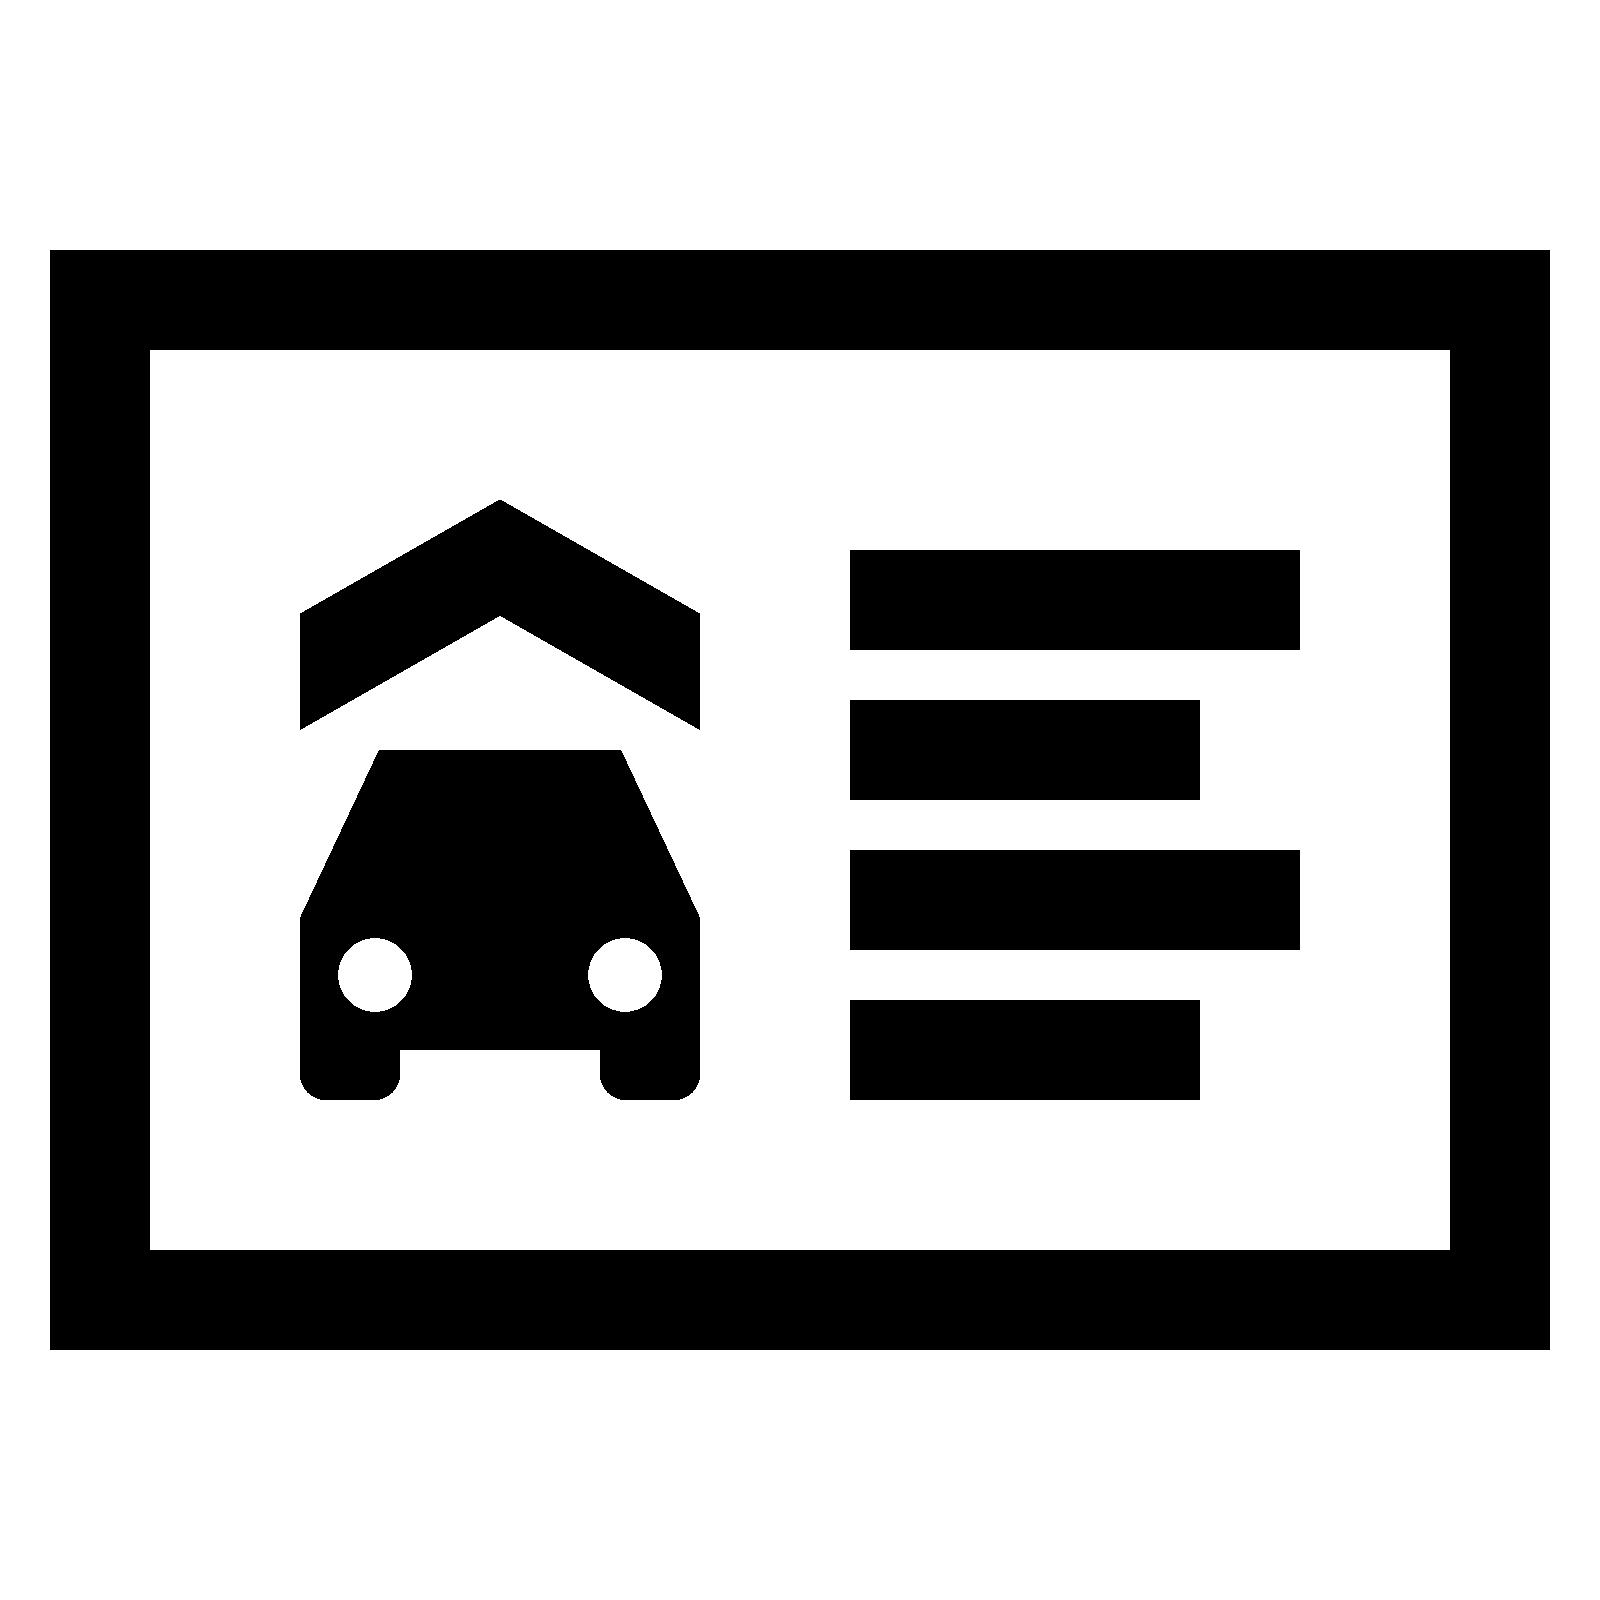 Card clipart car insurance Car Insurance Card Icons8 Card